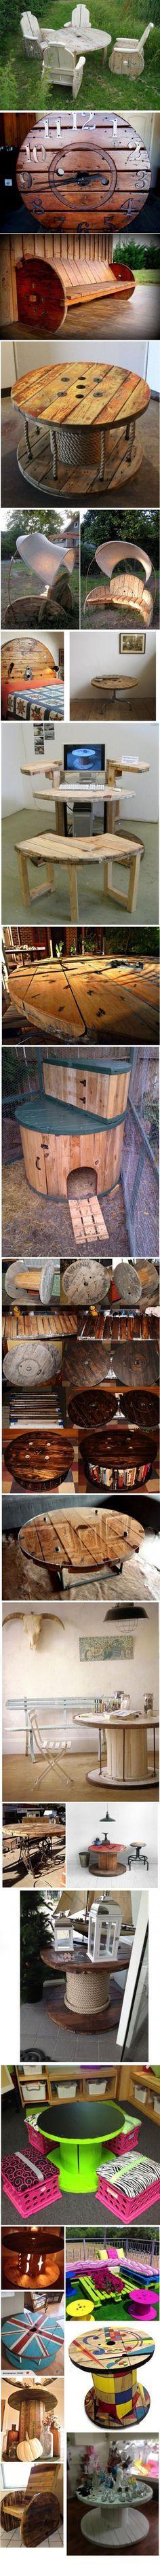 Ideas for repurposing a wire spool